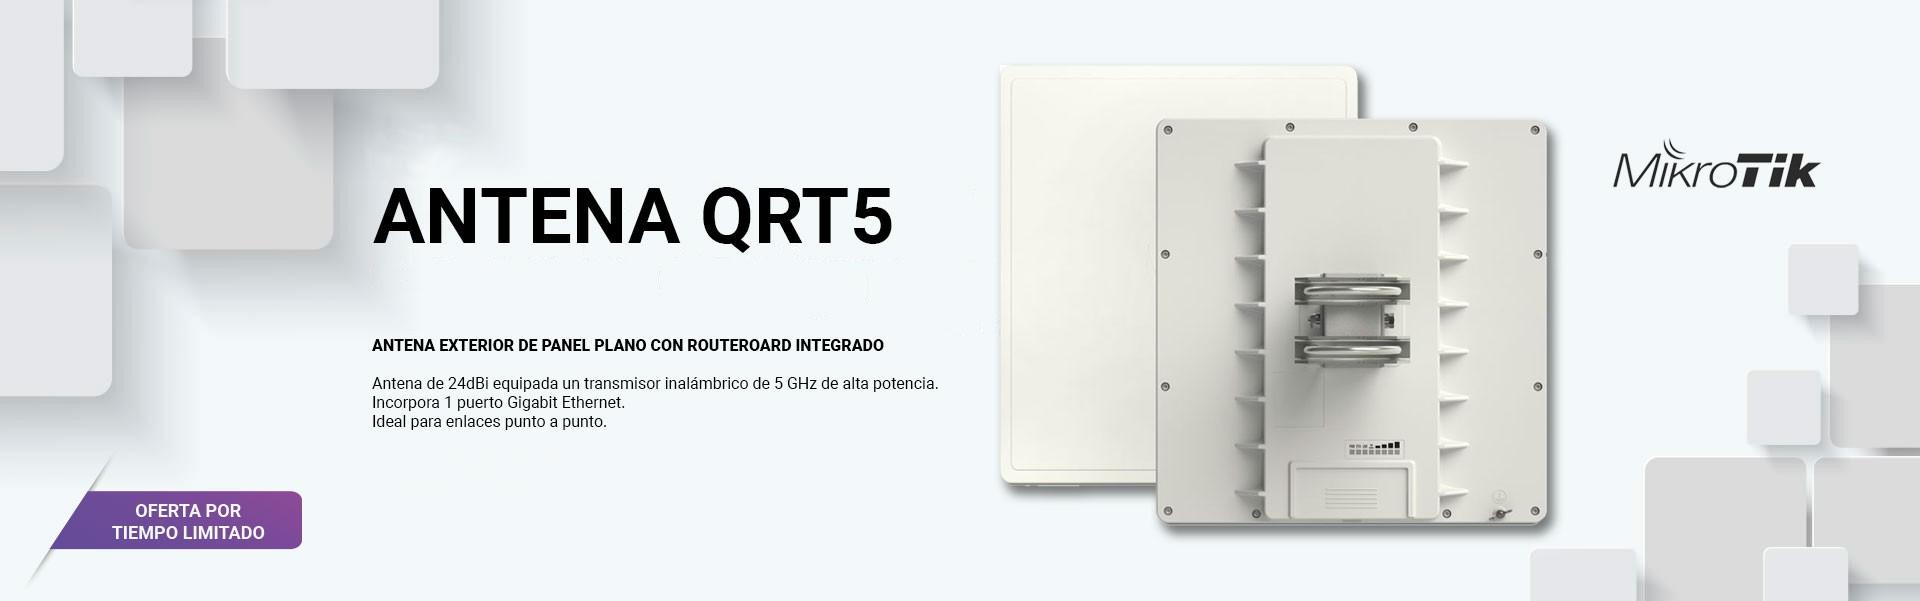 ANT QRT5